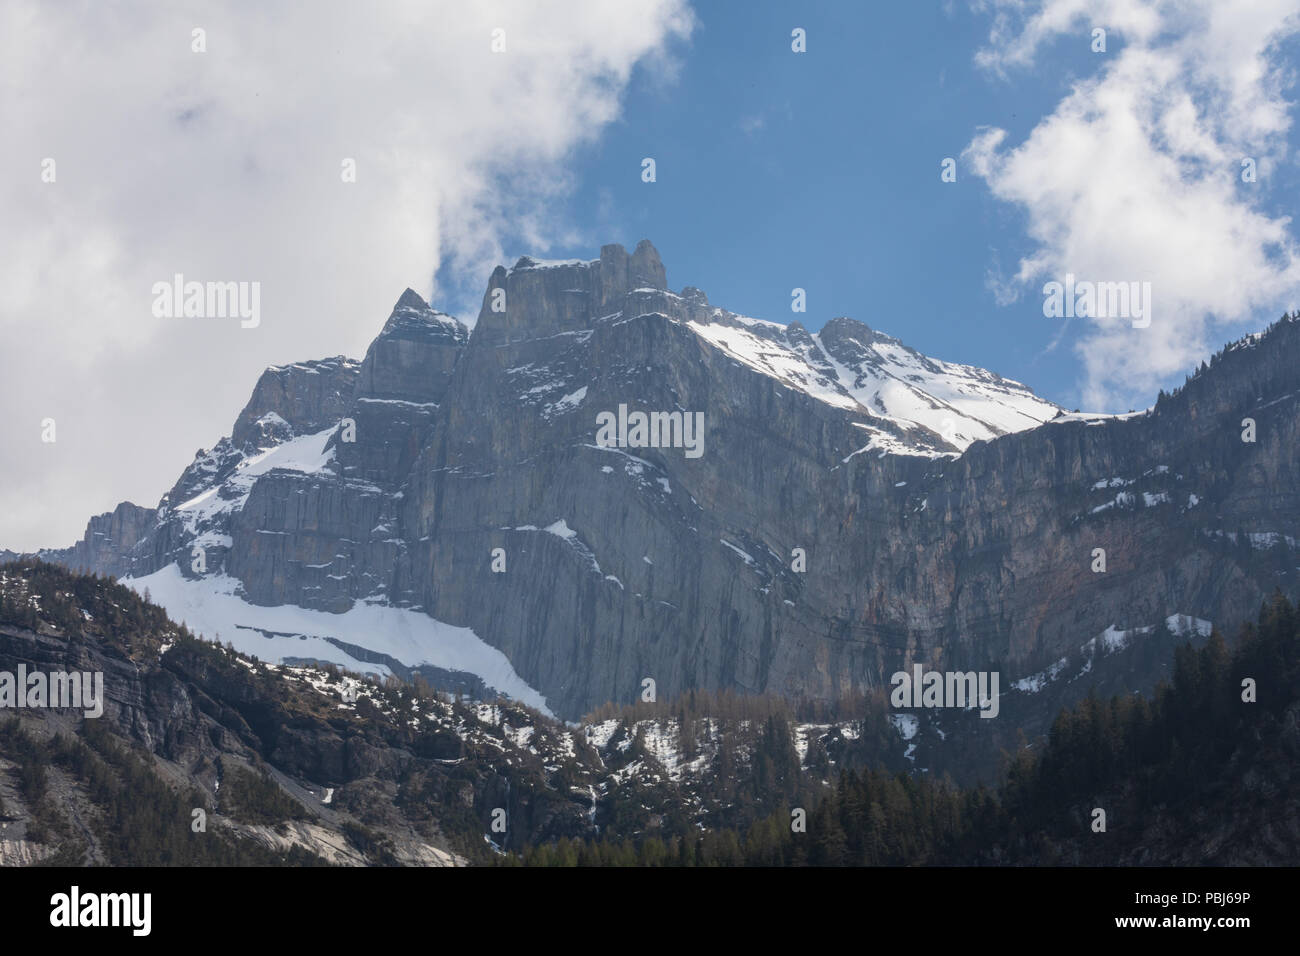 Panorama view of the Alps on a hiking path near Kandersteg switzerland Stock Photo